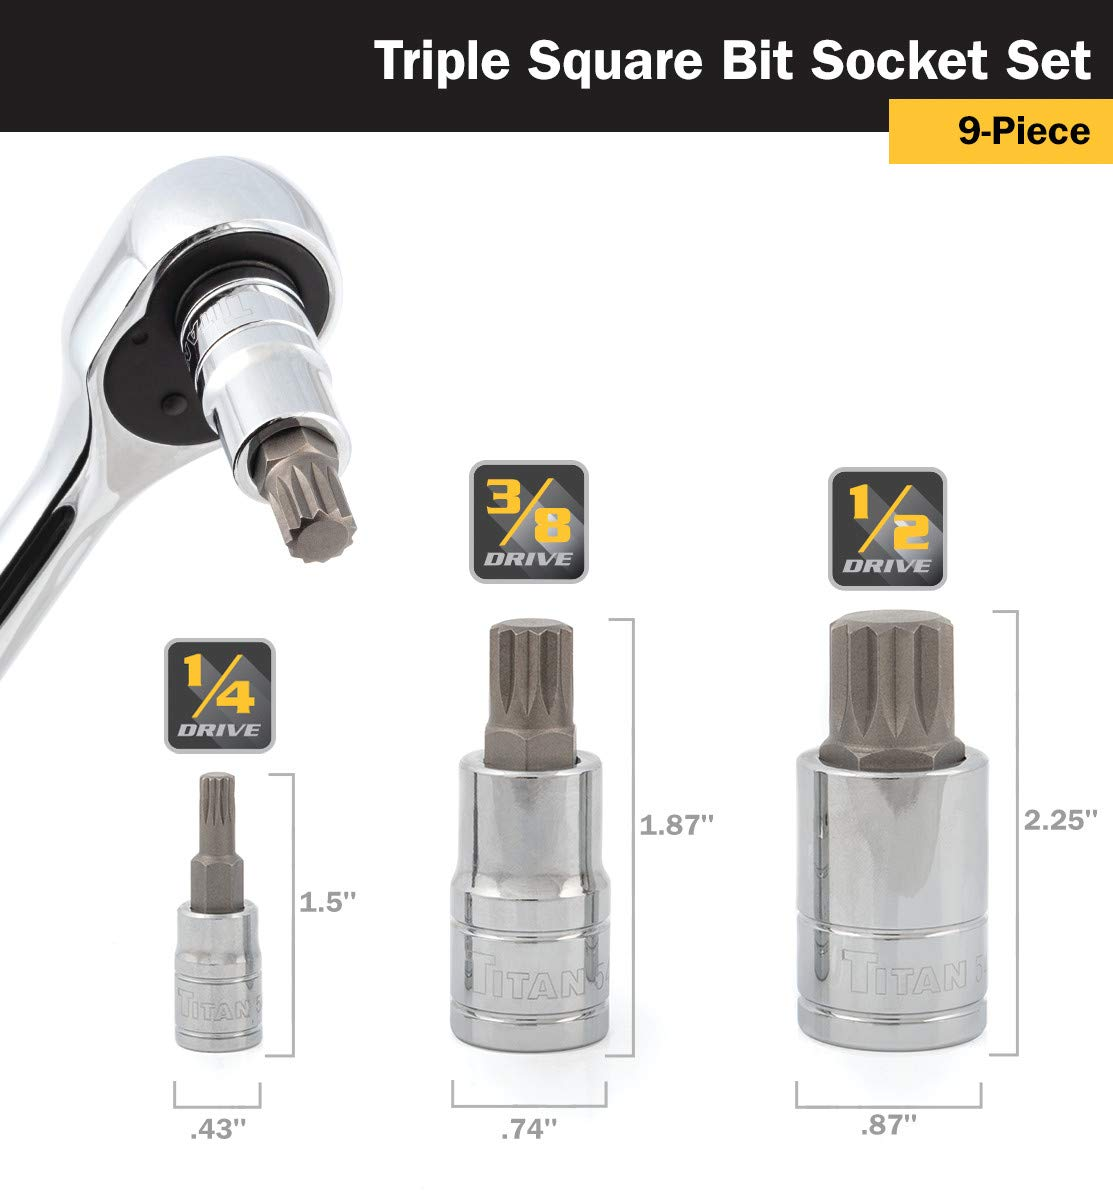 NEW 9 PIECE XZN TRIPLE SQUARE BIT SOCKET SET TITAN 16144